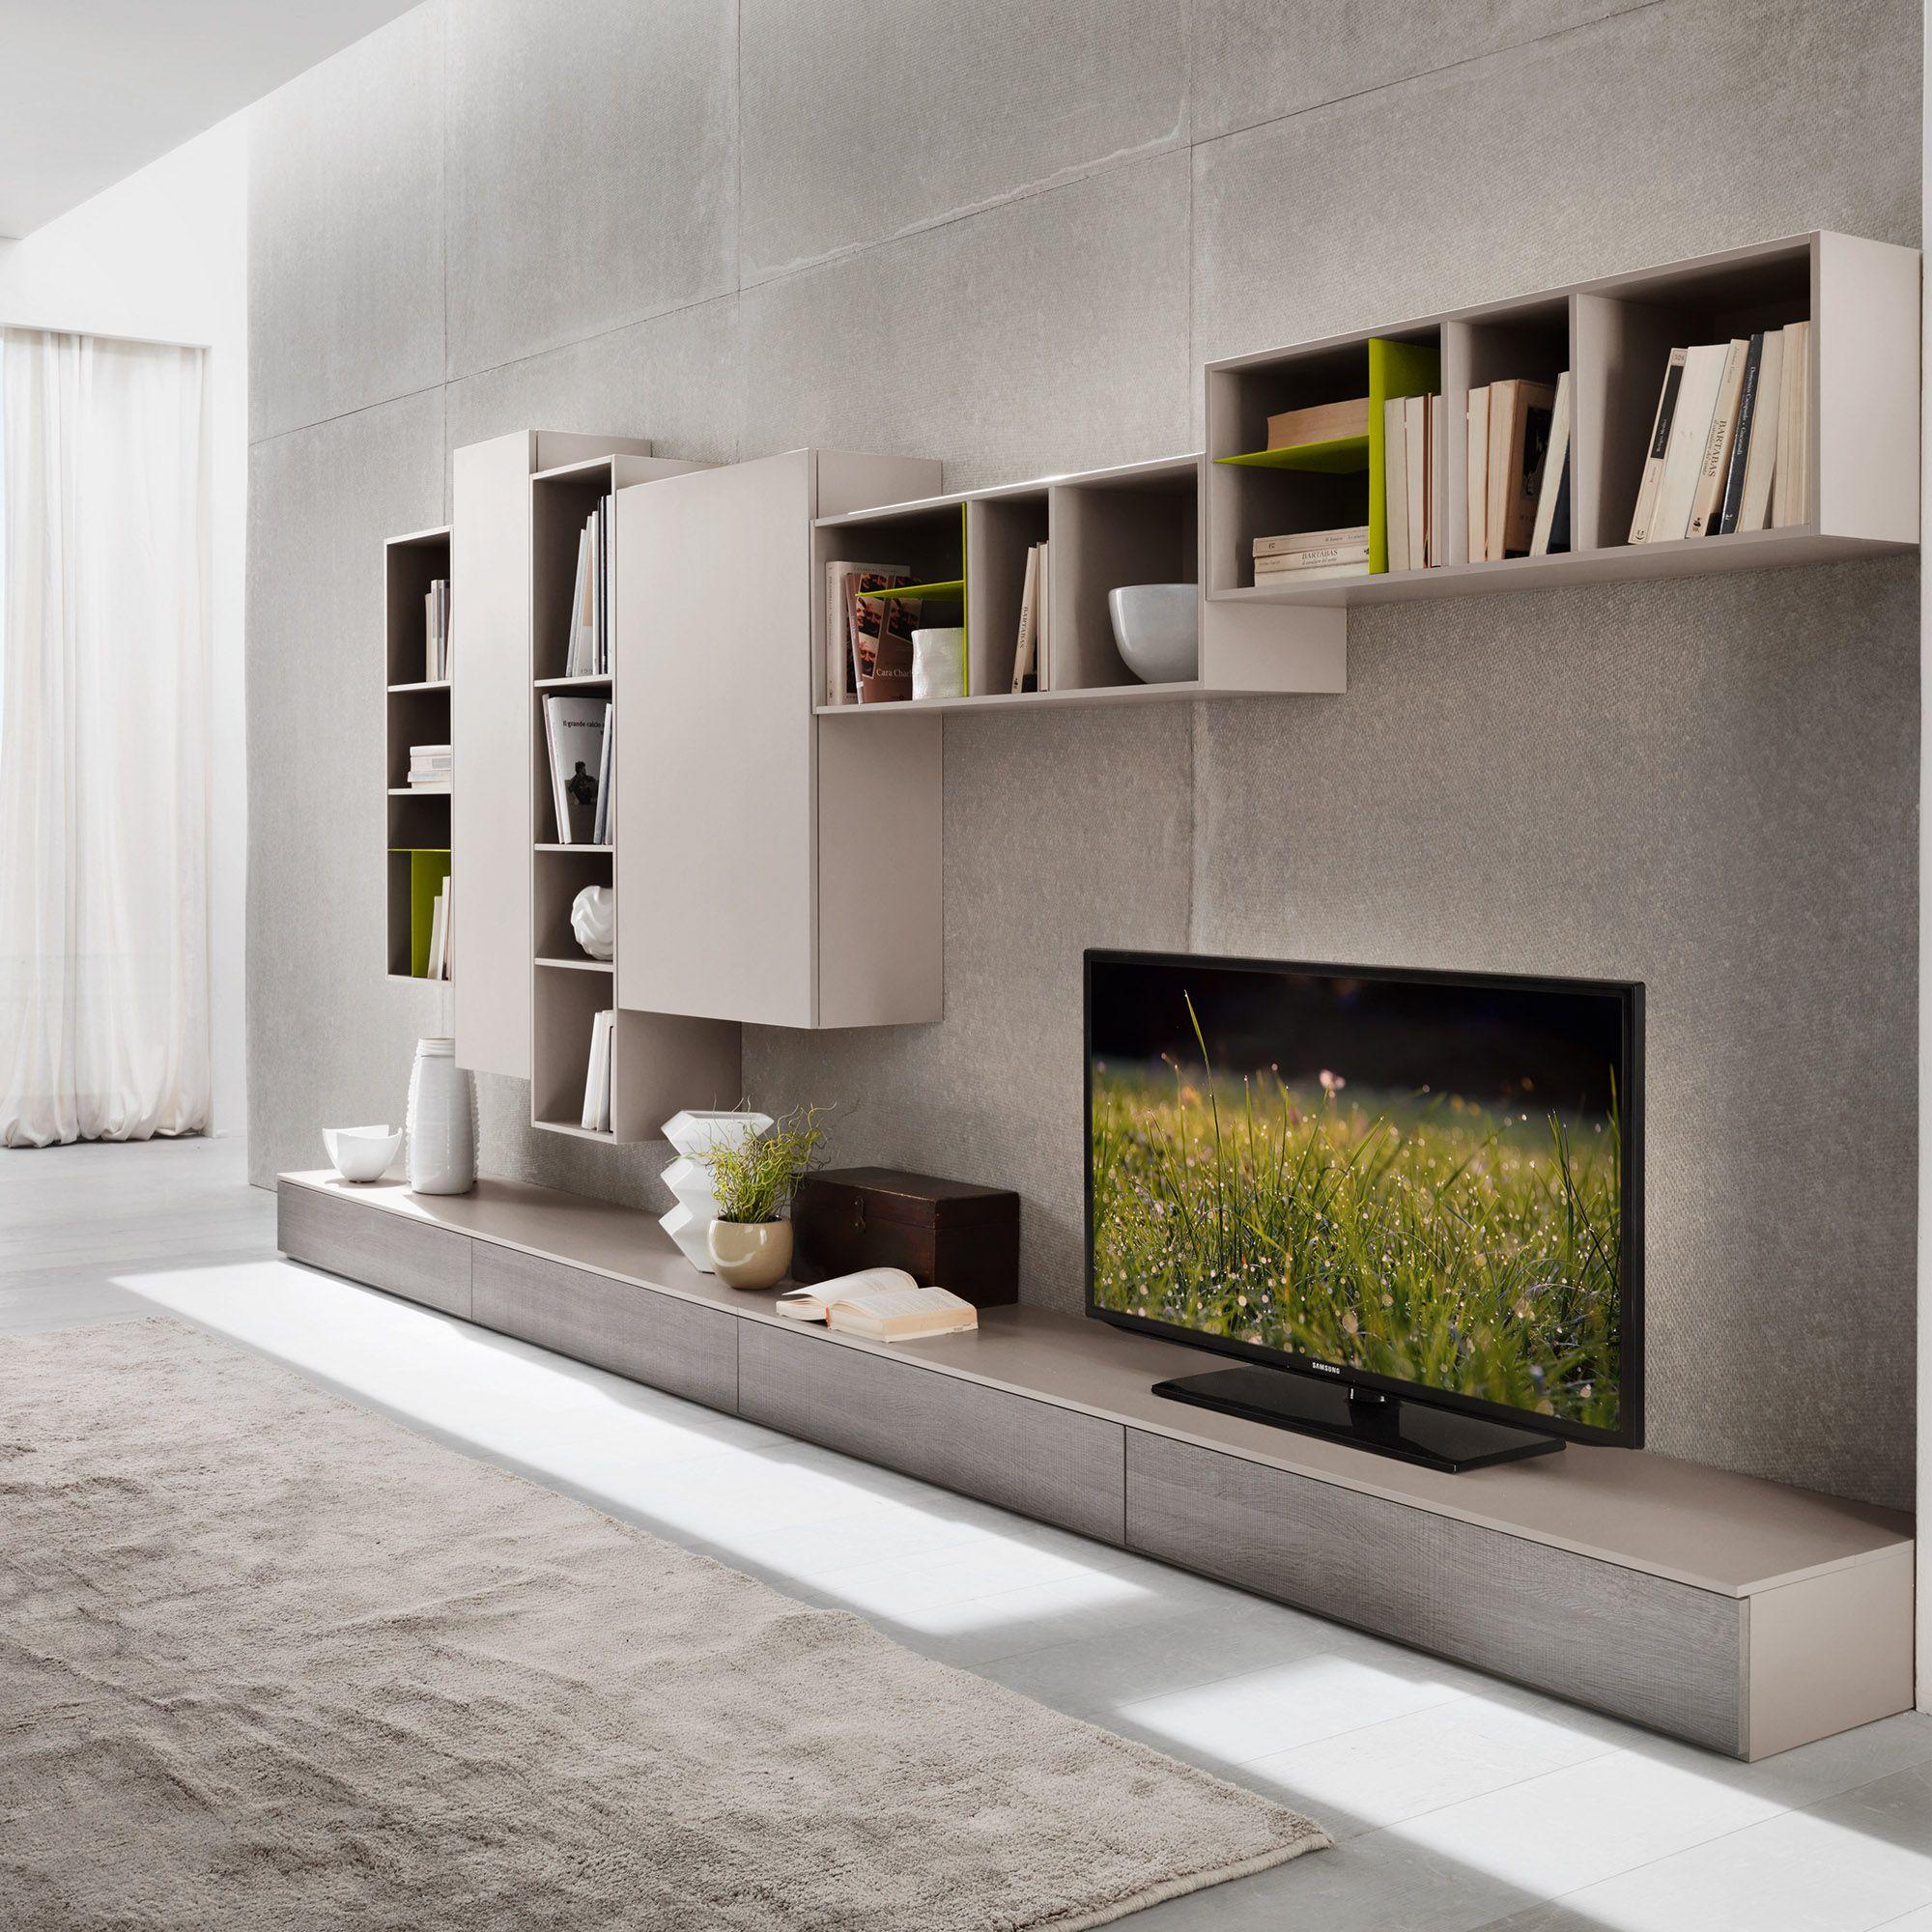 Tv Unit Modern Contemporary Design By Siluetto 360 Cm Length At